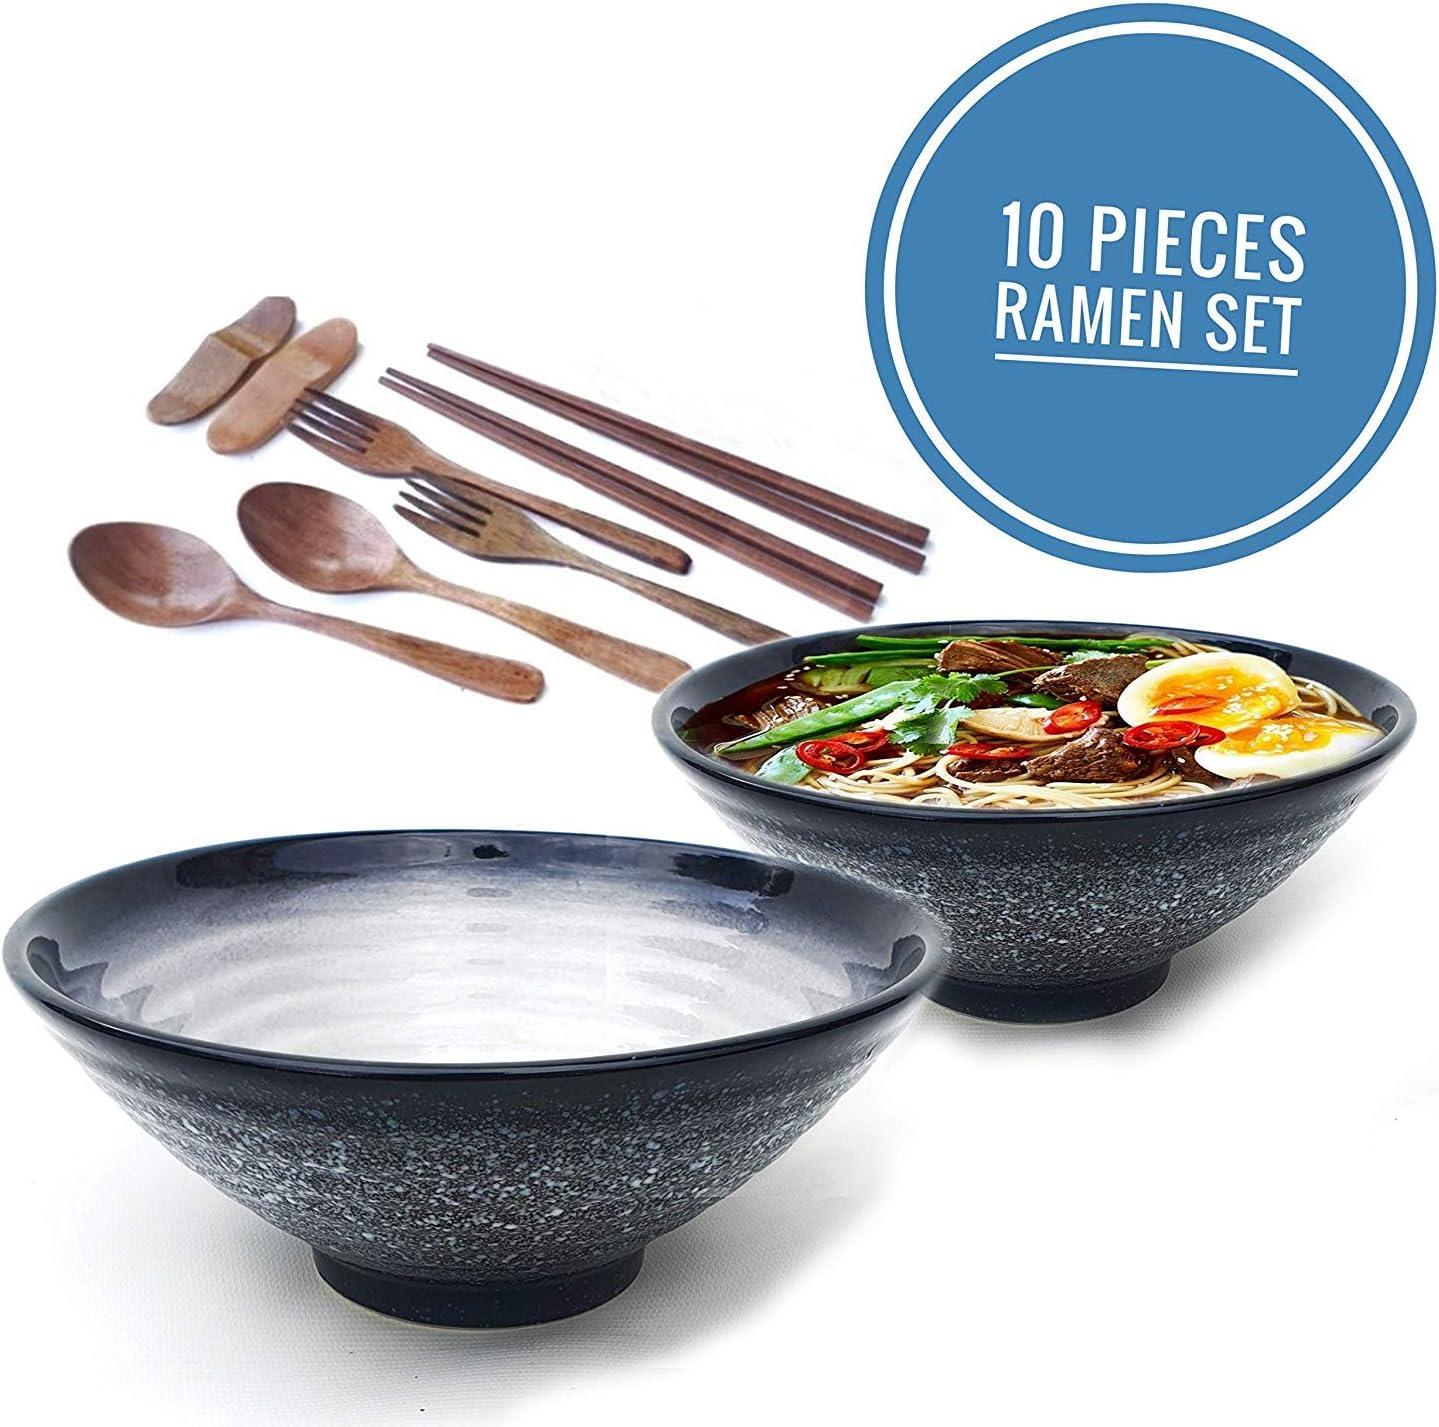 Ceramic Ramen bowl XL. Premium set. Black White. 2 Set (10 Pieces). Pho Bowls Asian Japanese With Spoons, Chopsticks, Double Stands and Fork. Large 55 Ounces for Noodles, Udon, Thai, Soup Meal…